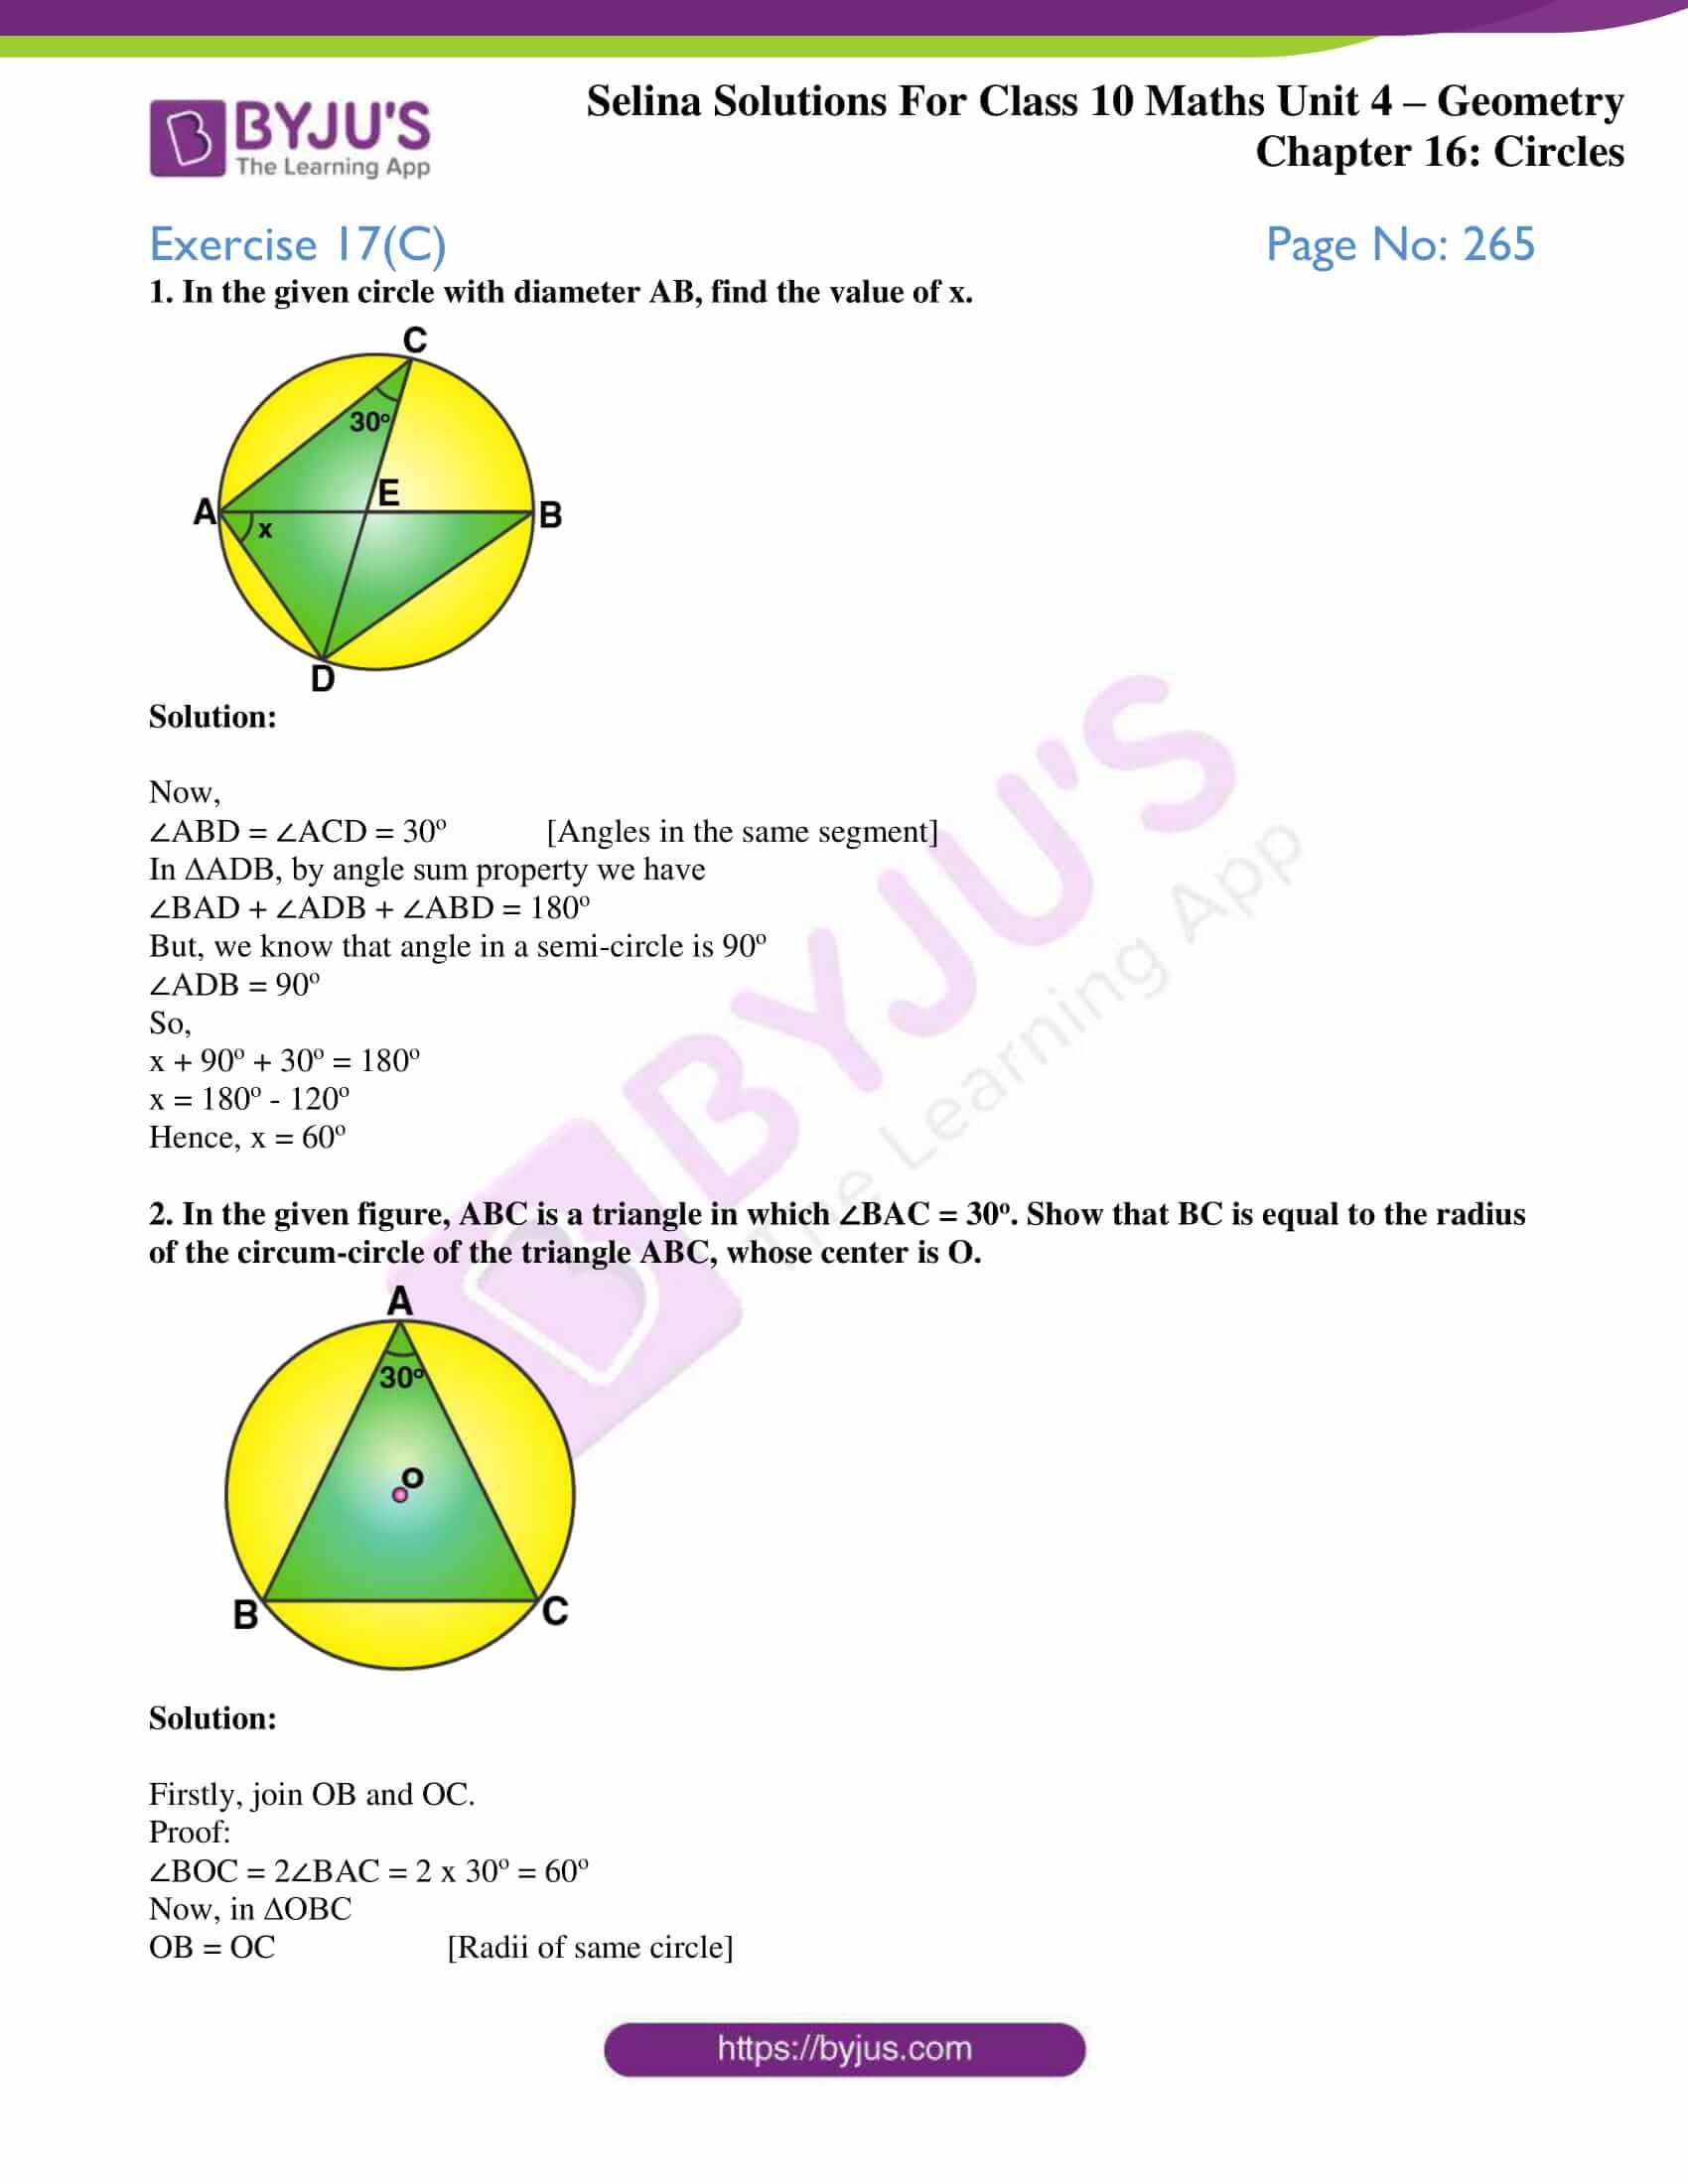 selina-sol-maths-class-10-ch-17-ex-c-1